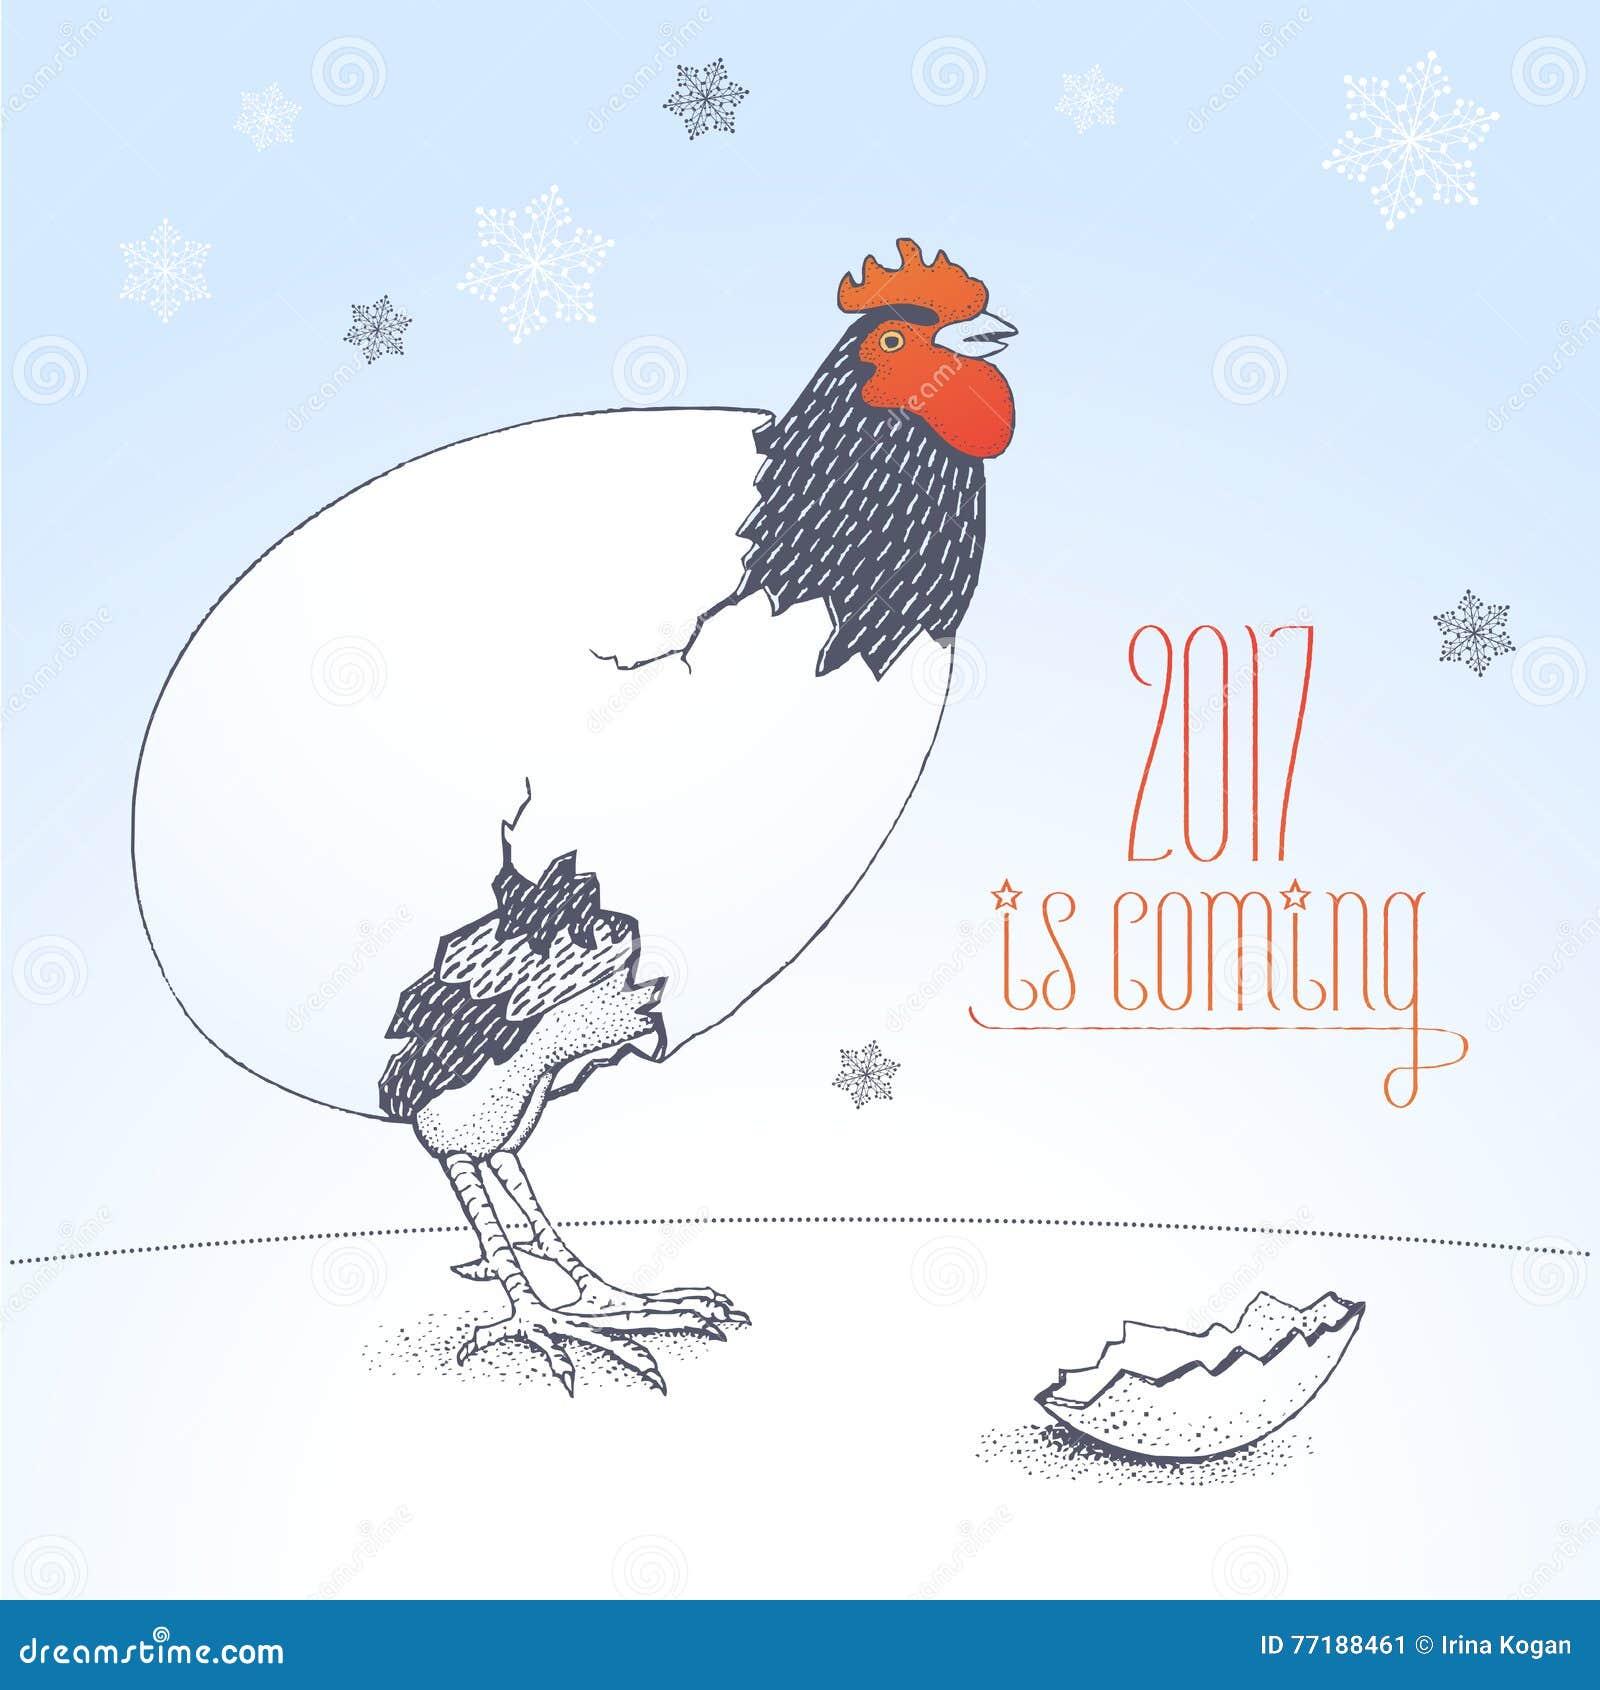 Happy new year 2017 vector funny seasonal greeting card stock vector happy new year 2017 vector funny seasonal greeting card m4hsunfo